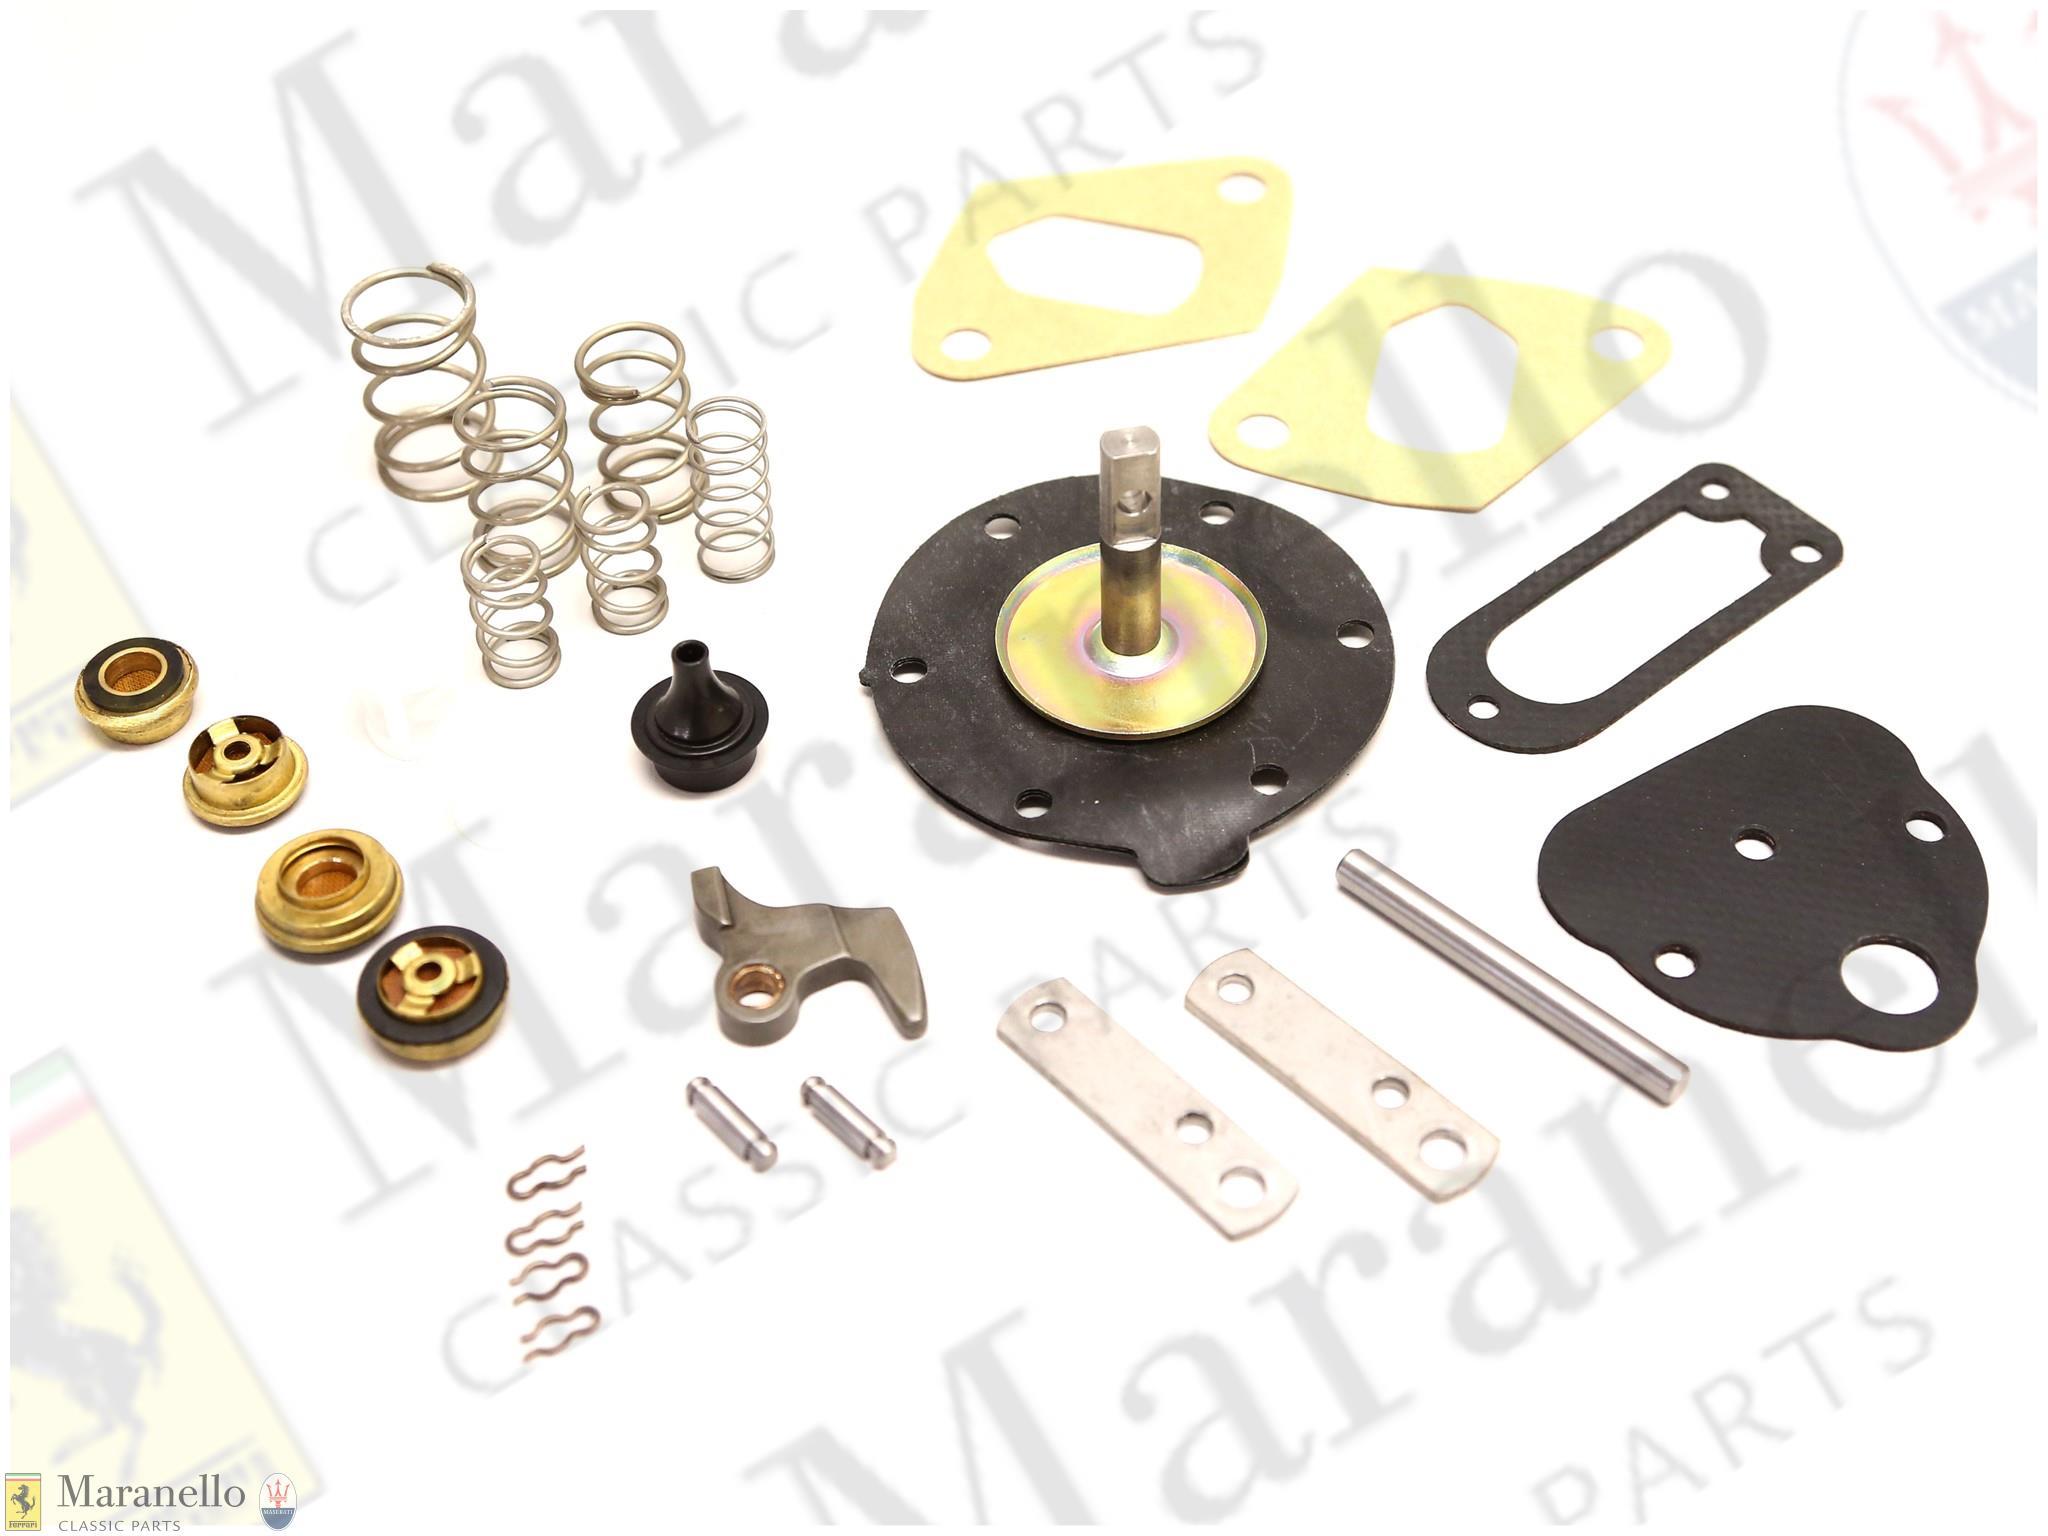 Ferrari 250 275 330 Mechanical Fuel Pump Rebuild Kit Fispa 95180130